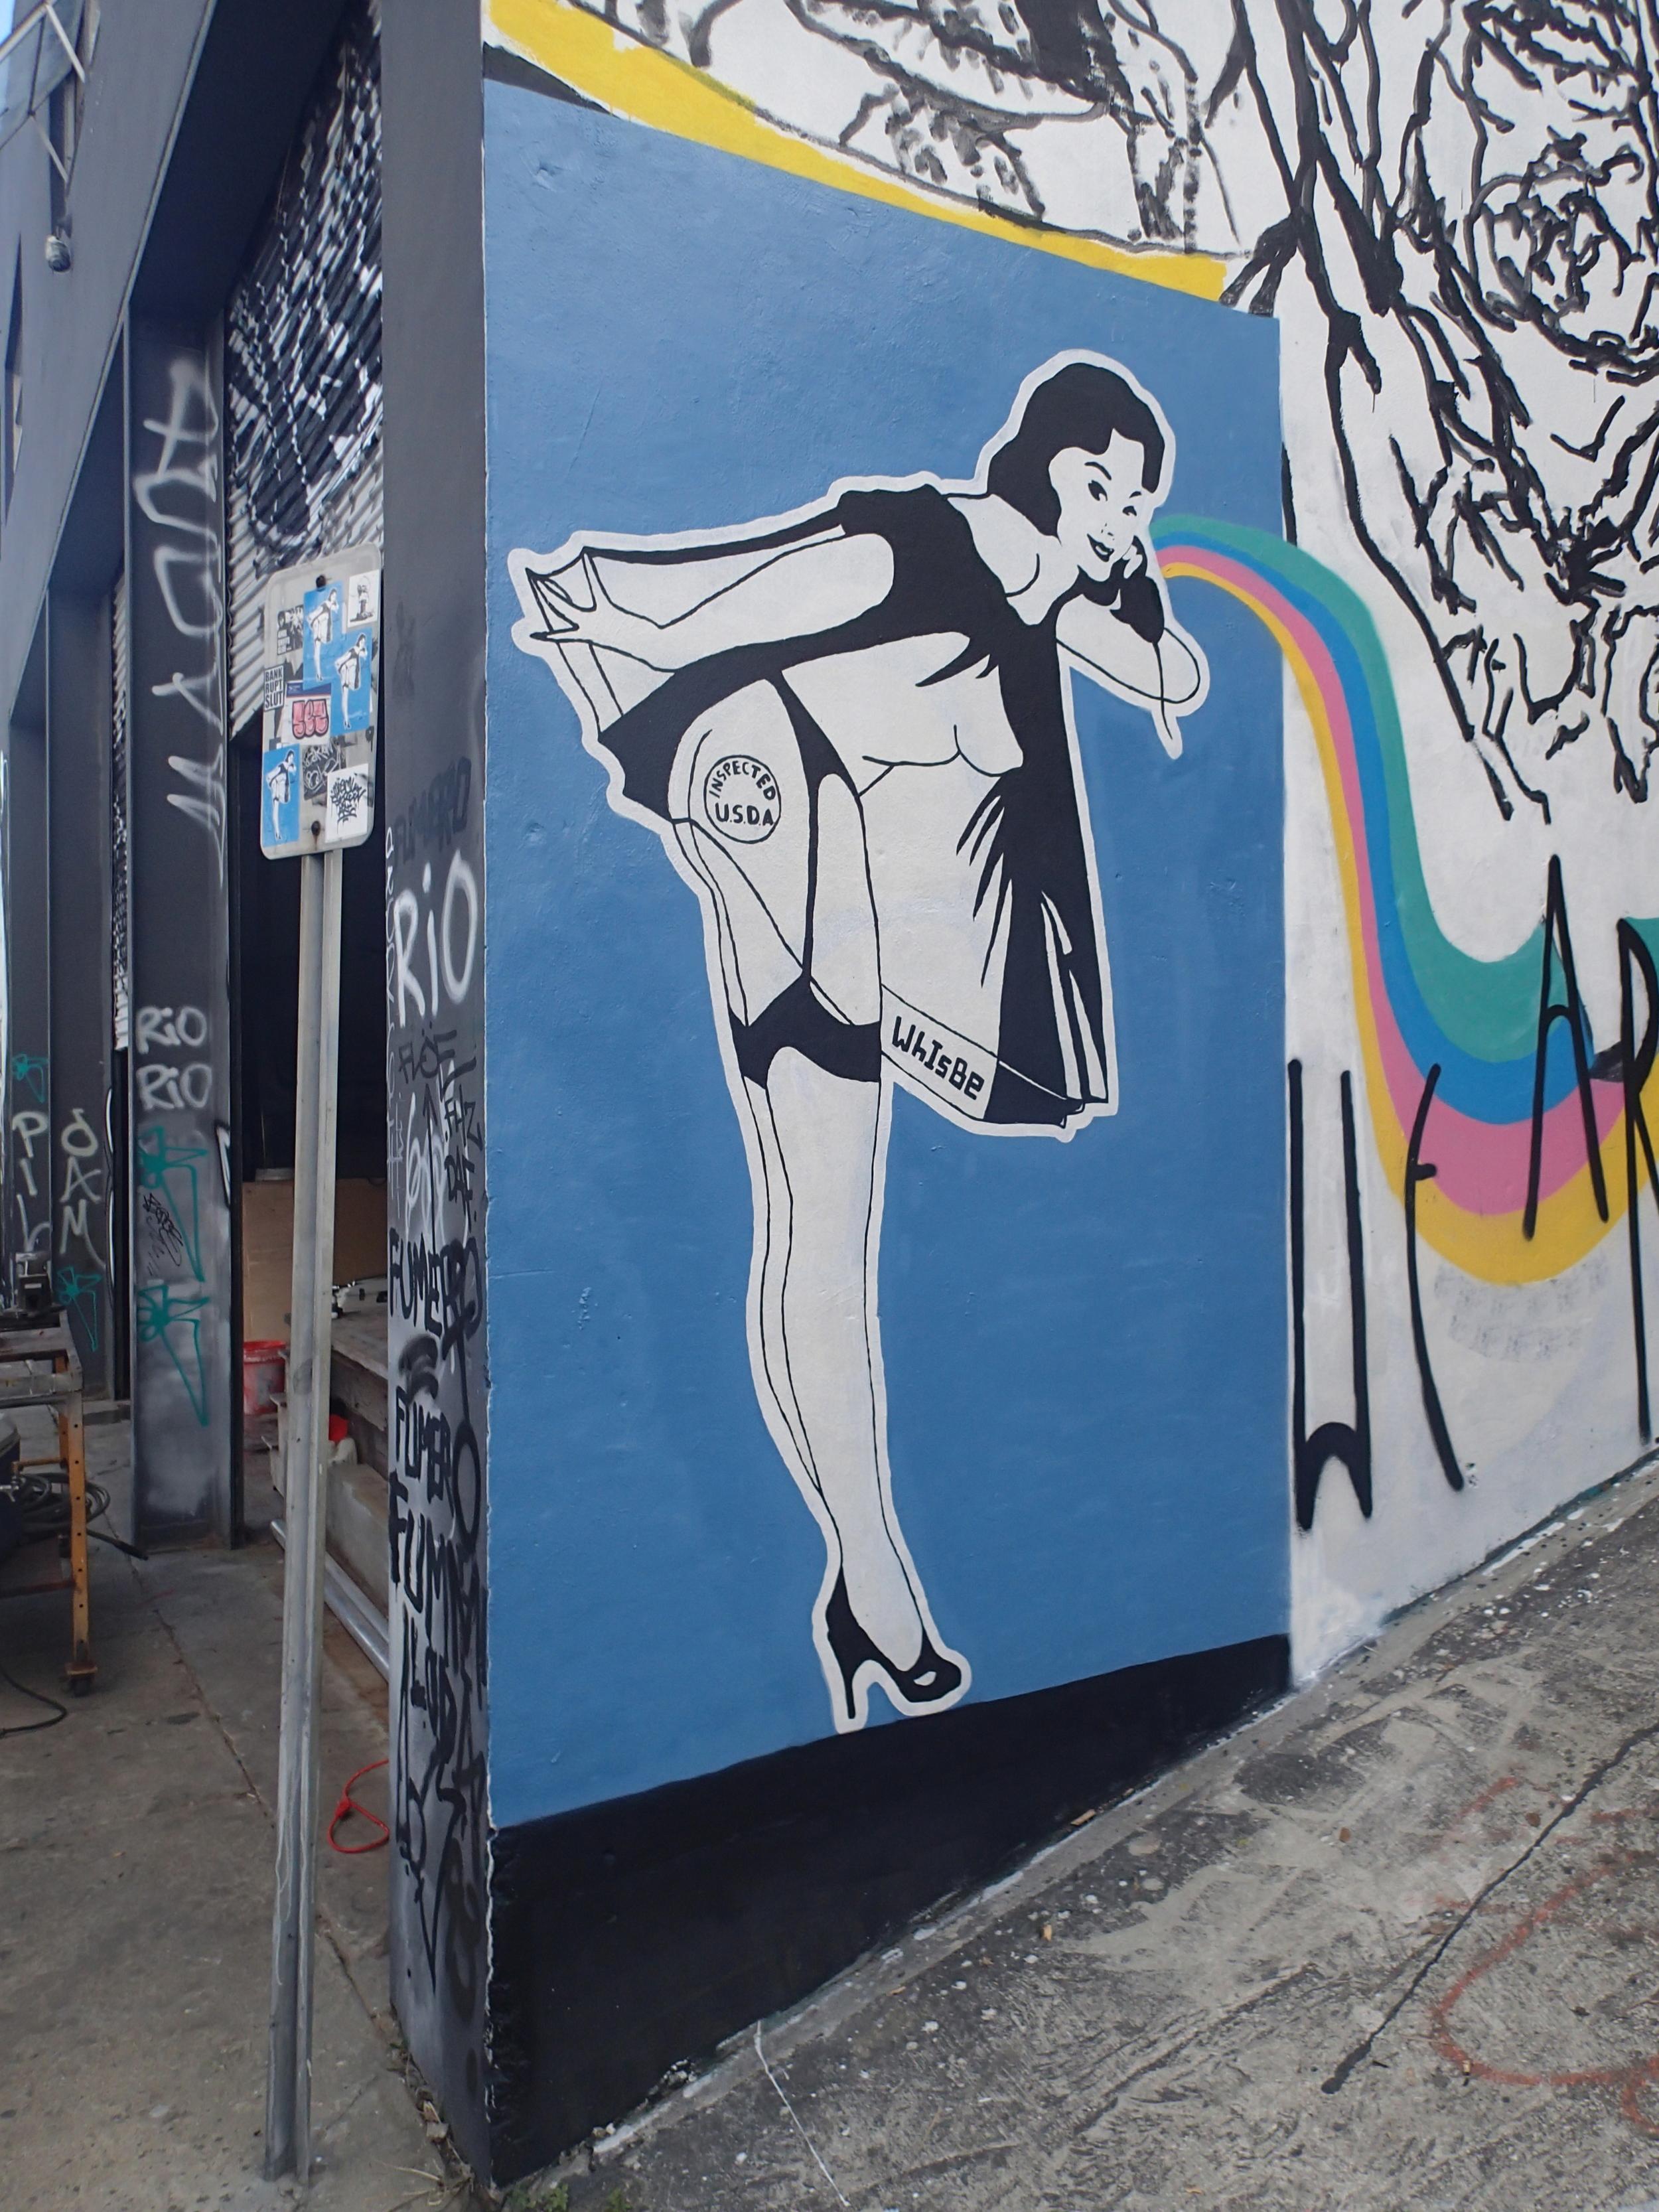 Wynwood Walls [Miami, FL]